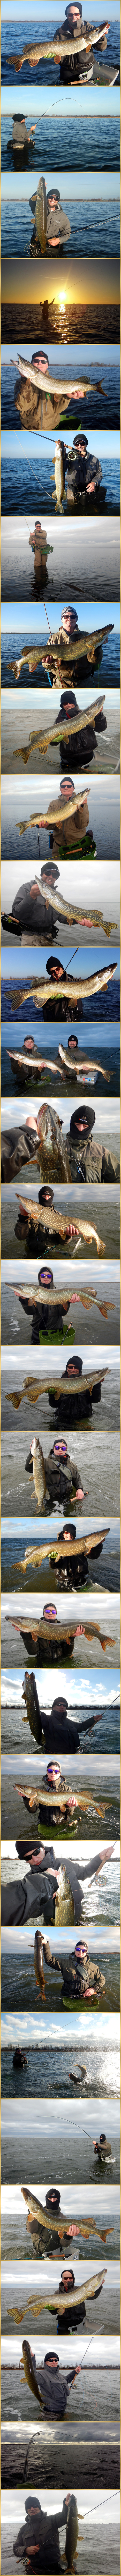 flyfishing for pike